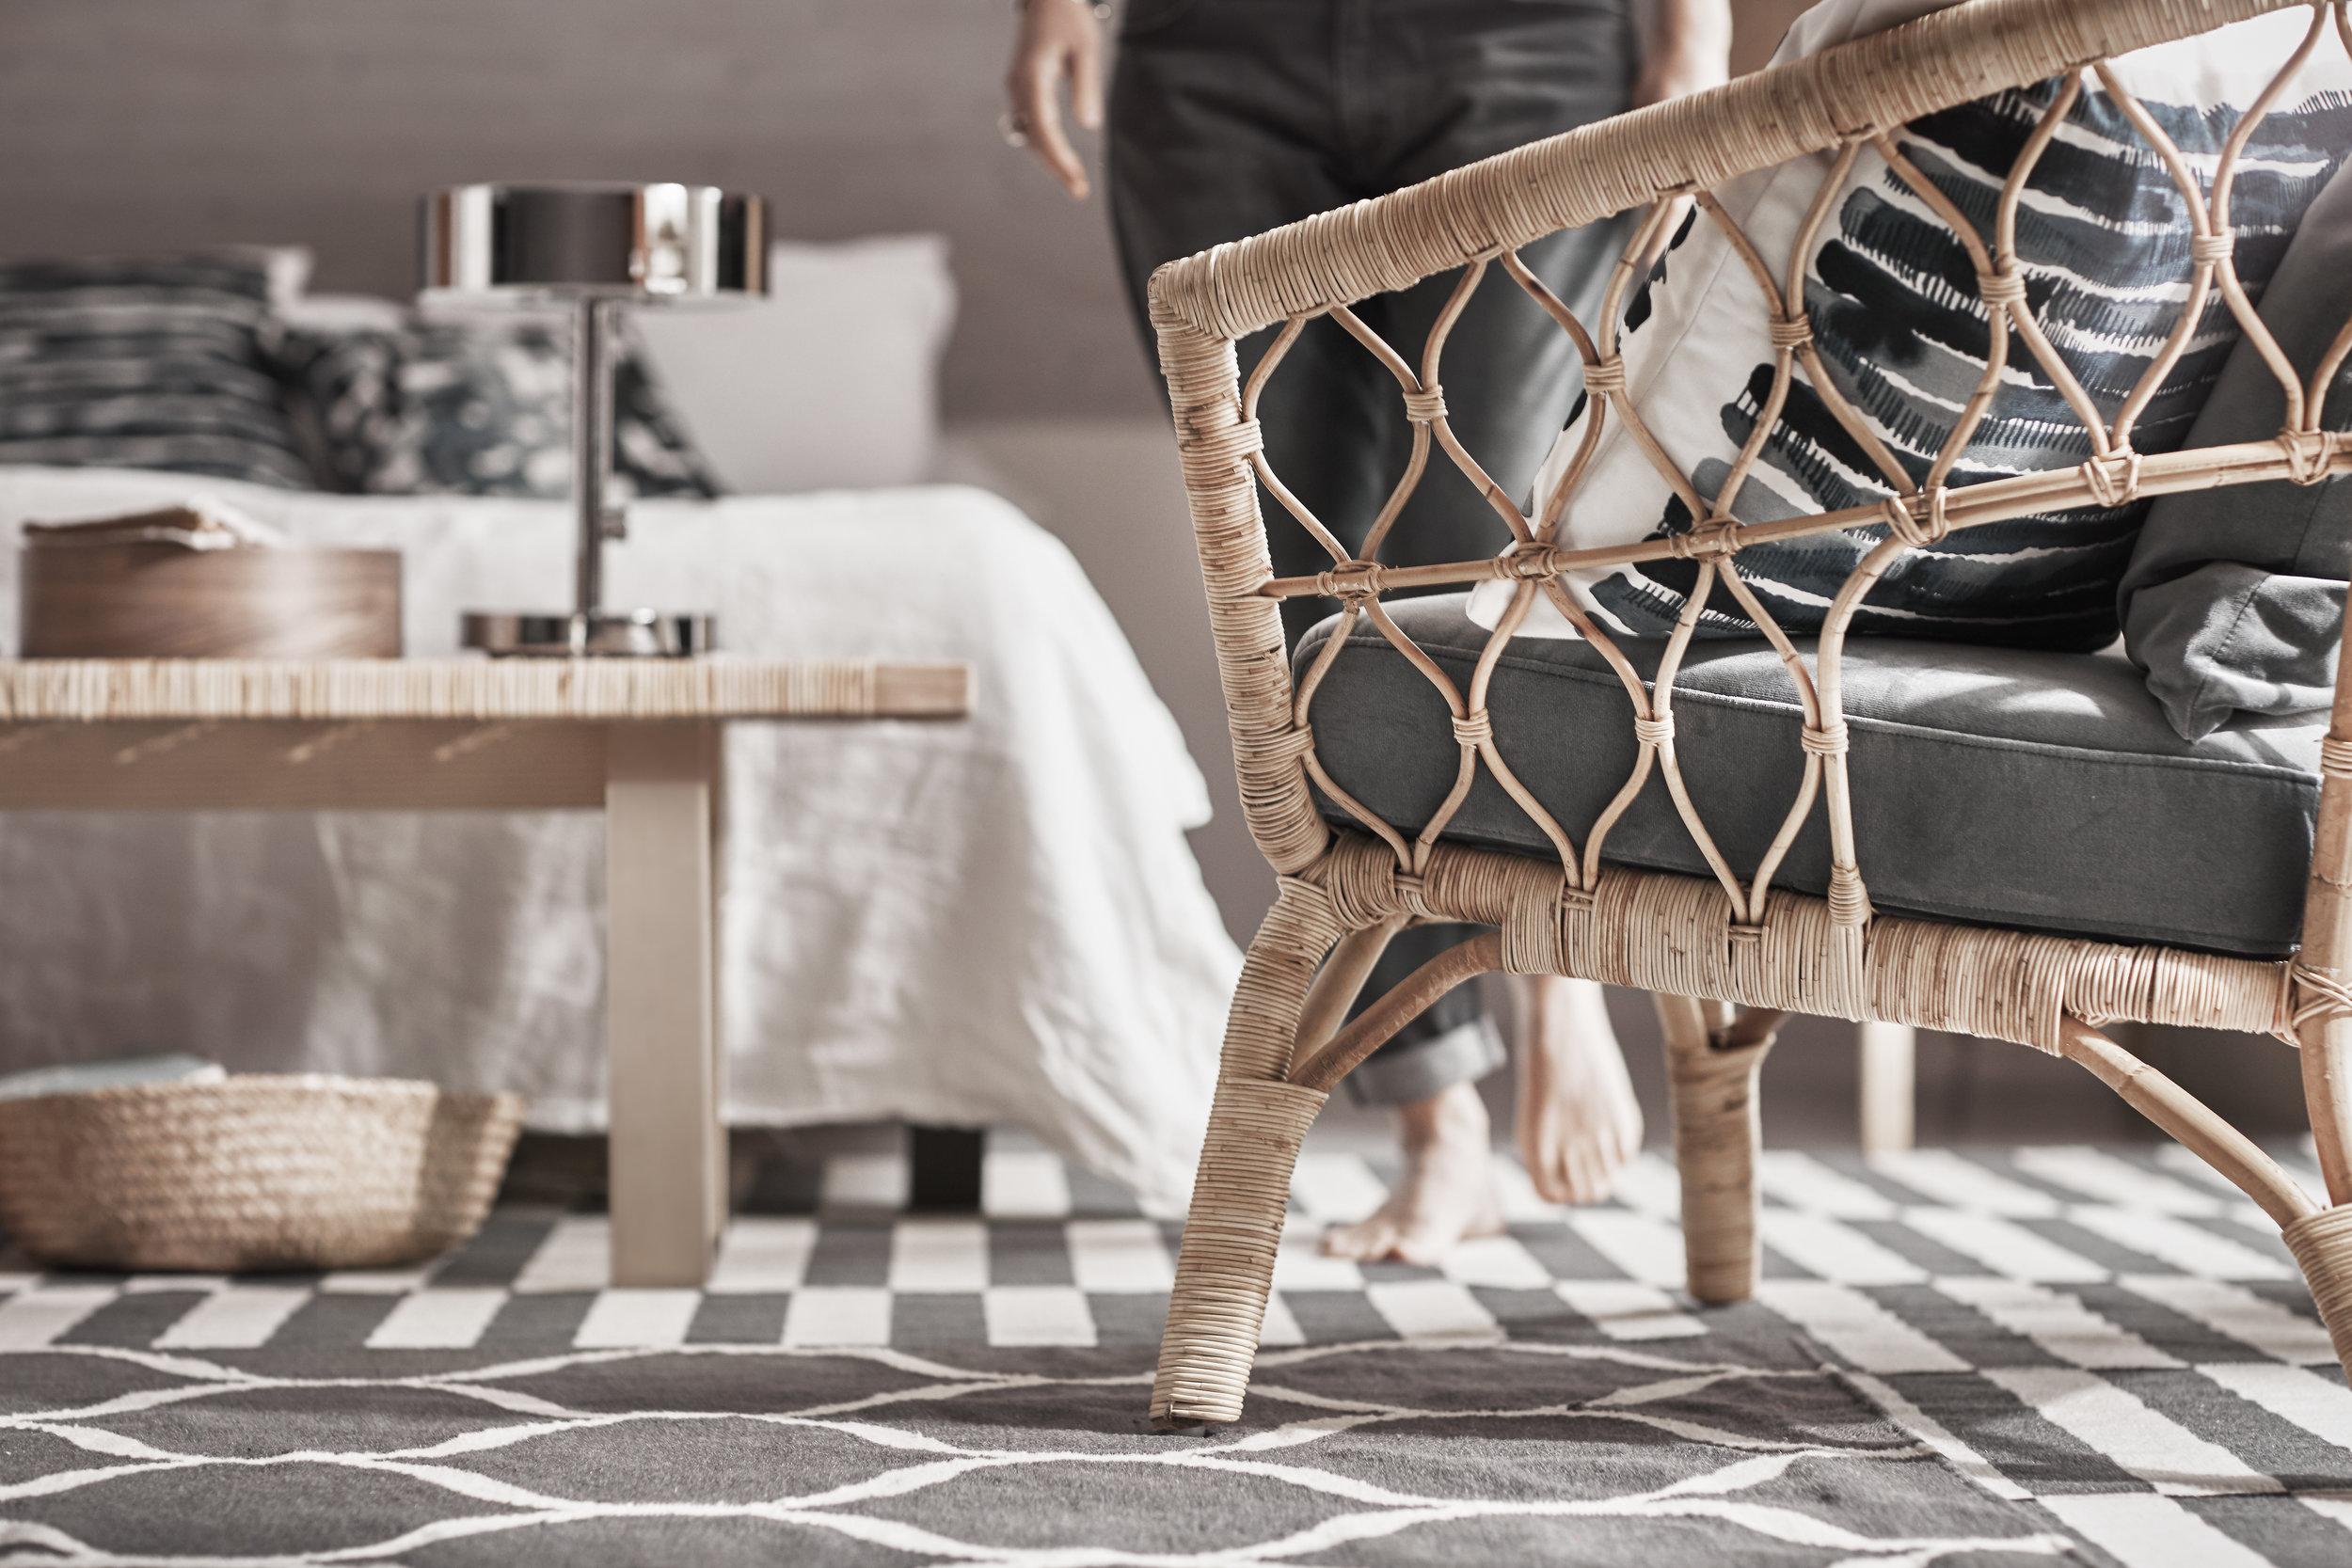 Rattan chair  - £175 - Ikea